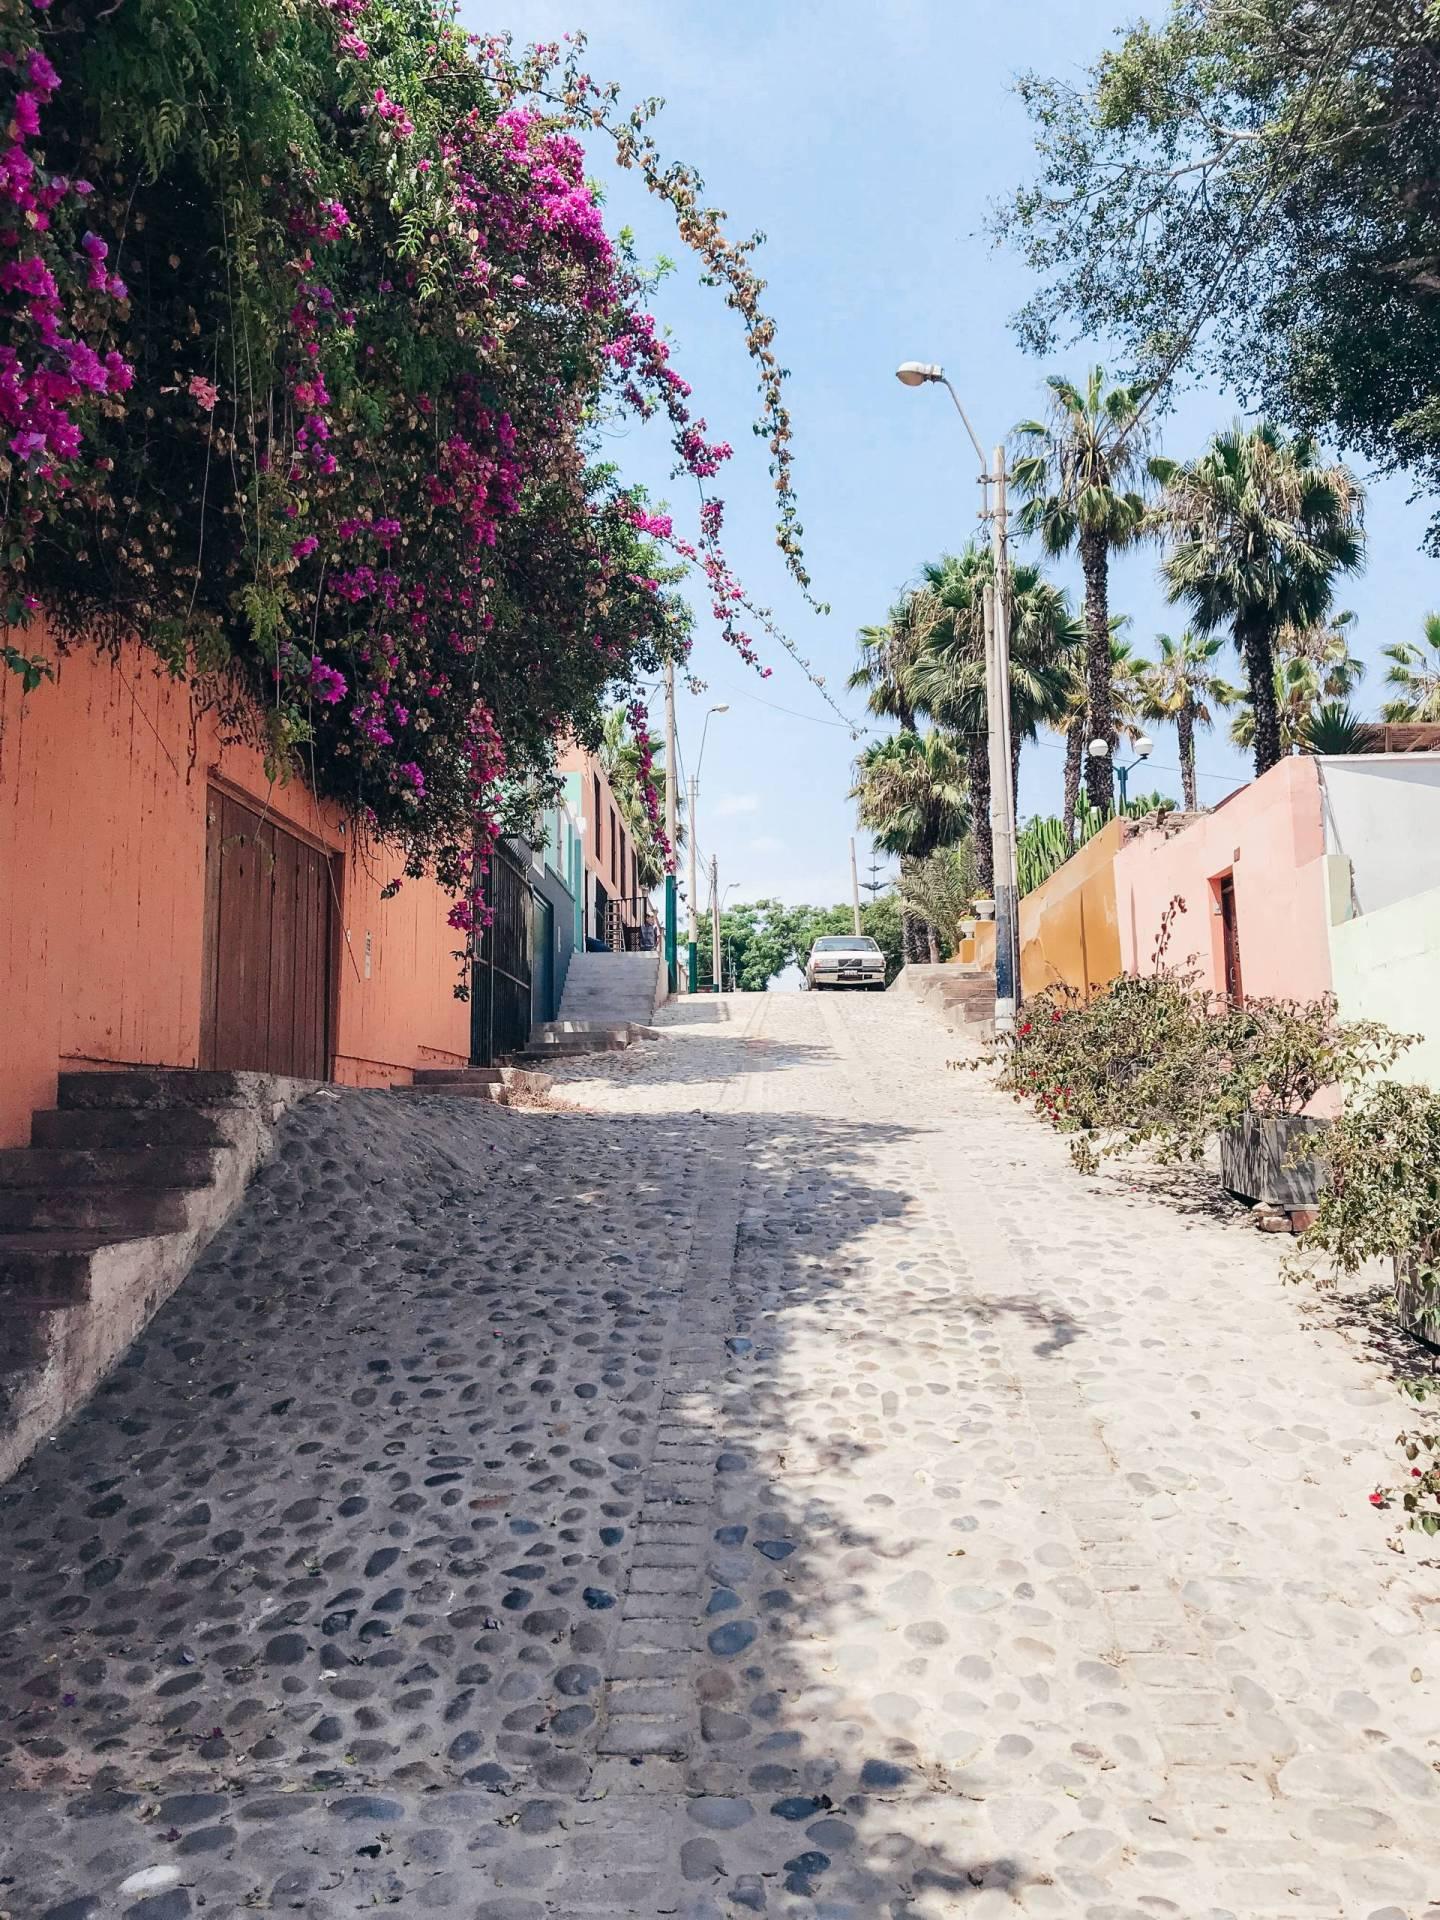 The Colorful Barranco Neighborhood in Lima, Peru